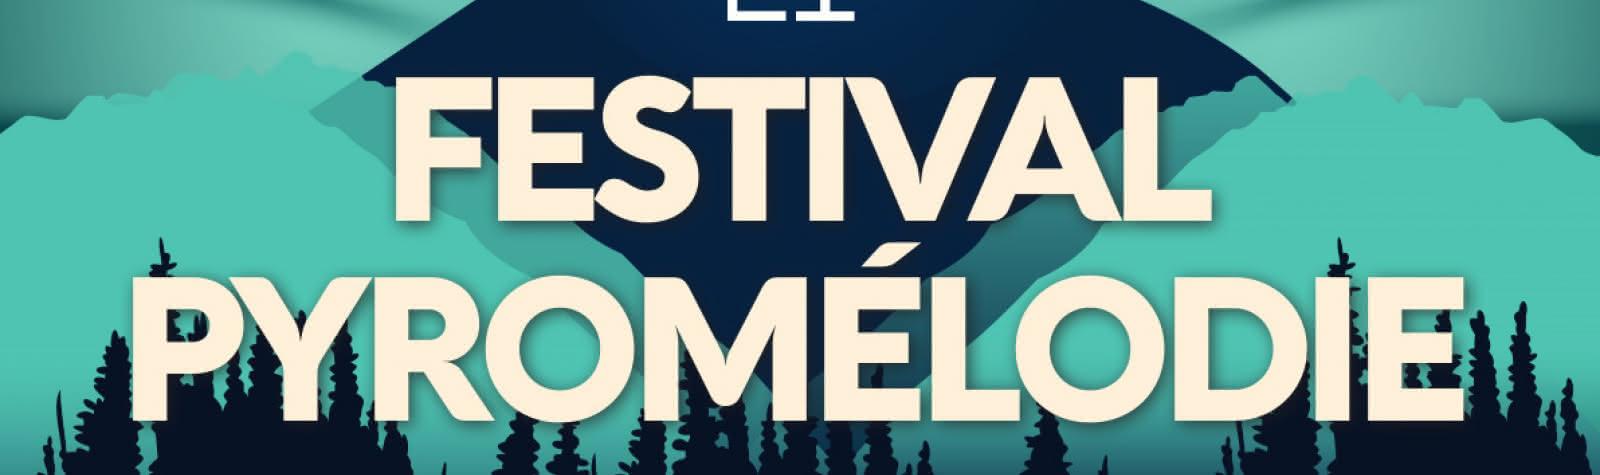 [ANNULÉ] Festival Pyromélodie